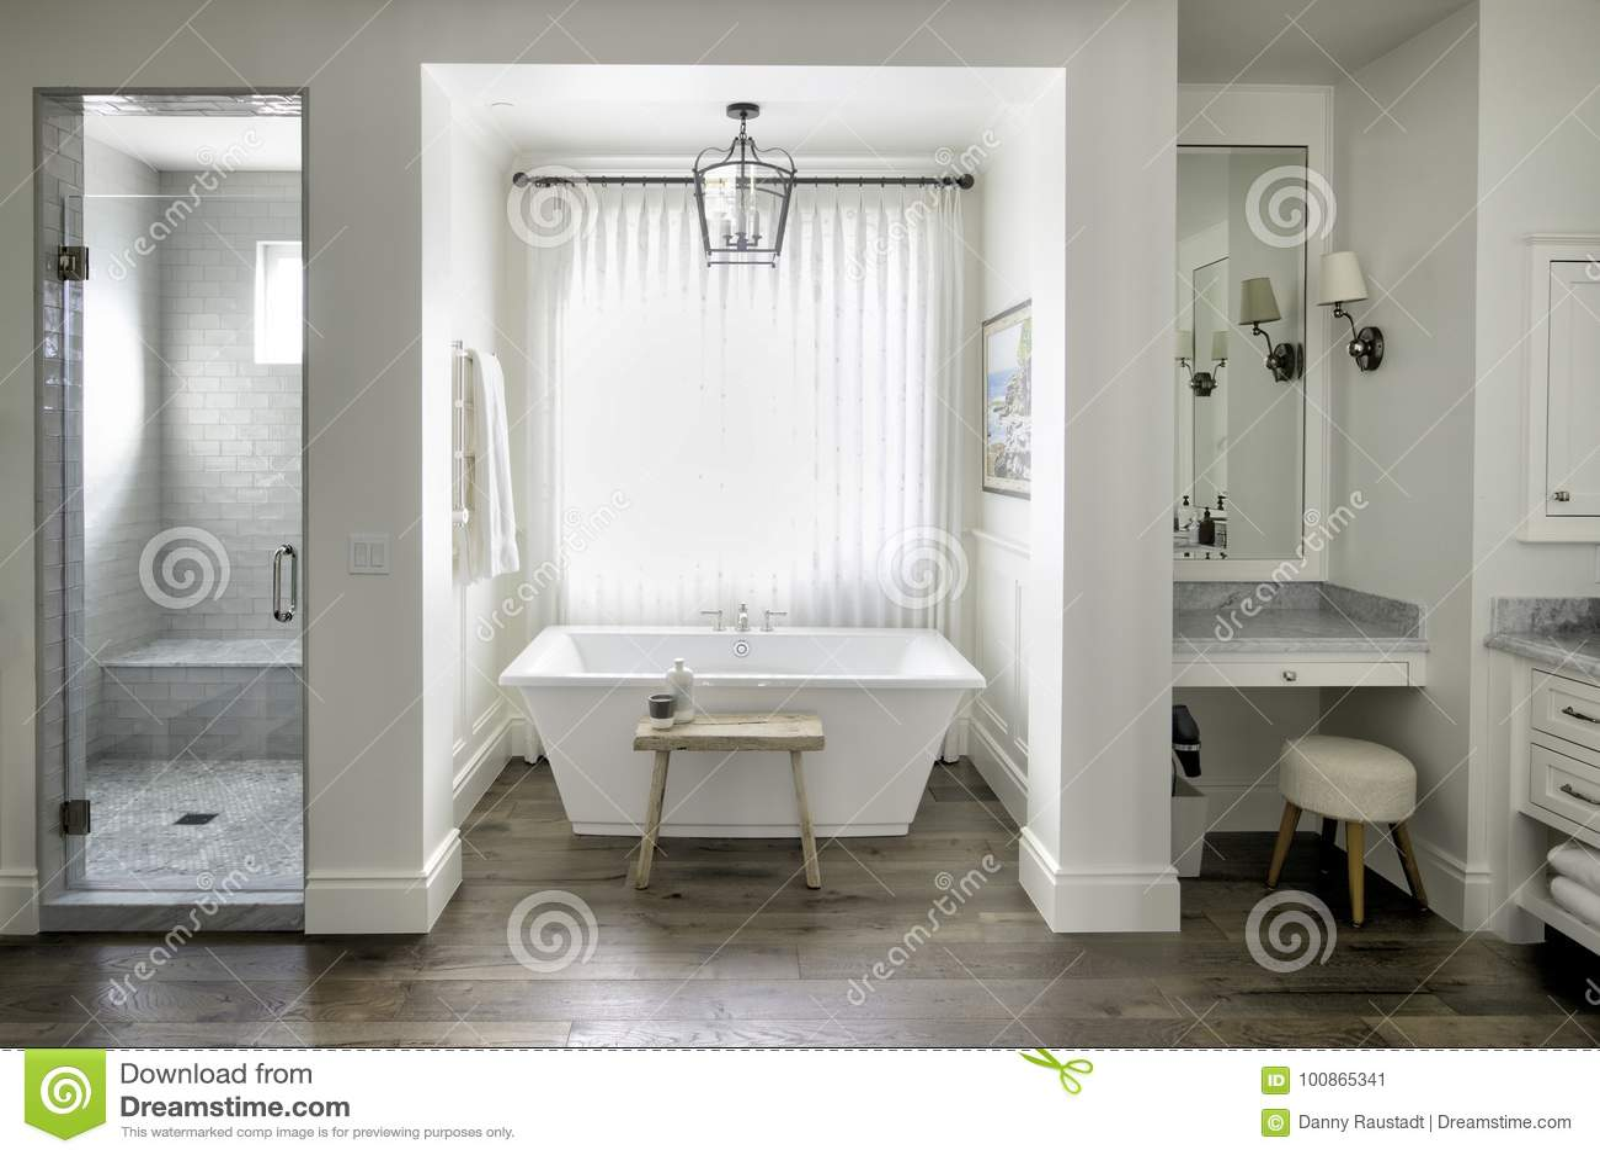 Erholungsortvillenbadezimmerbadekurort